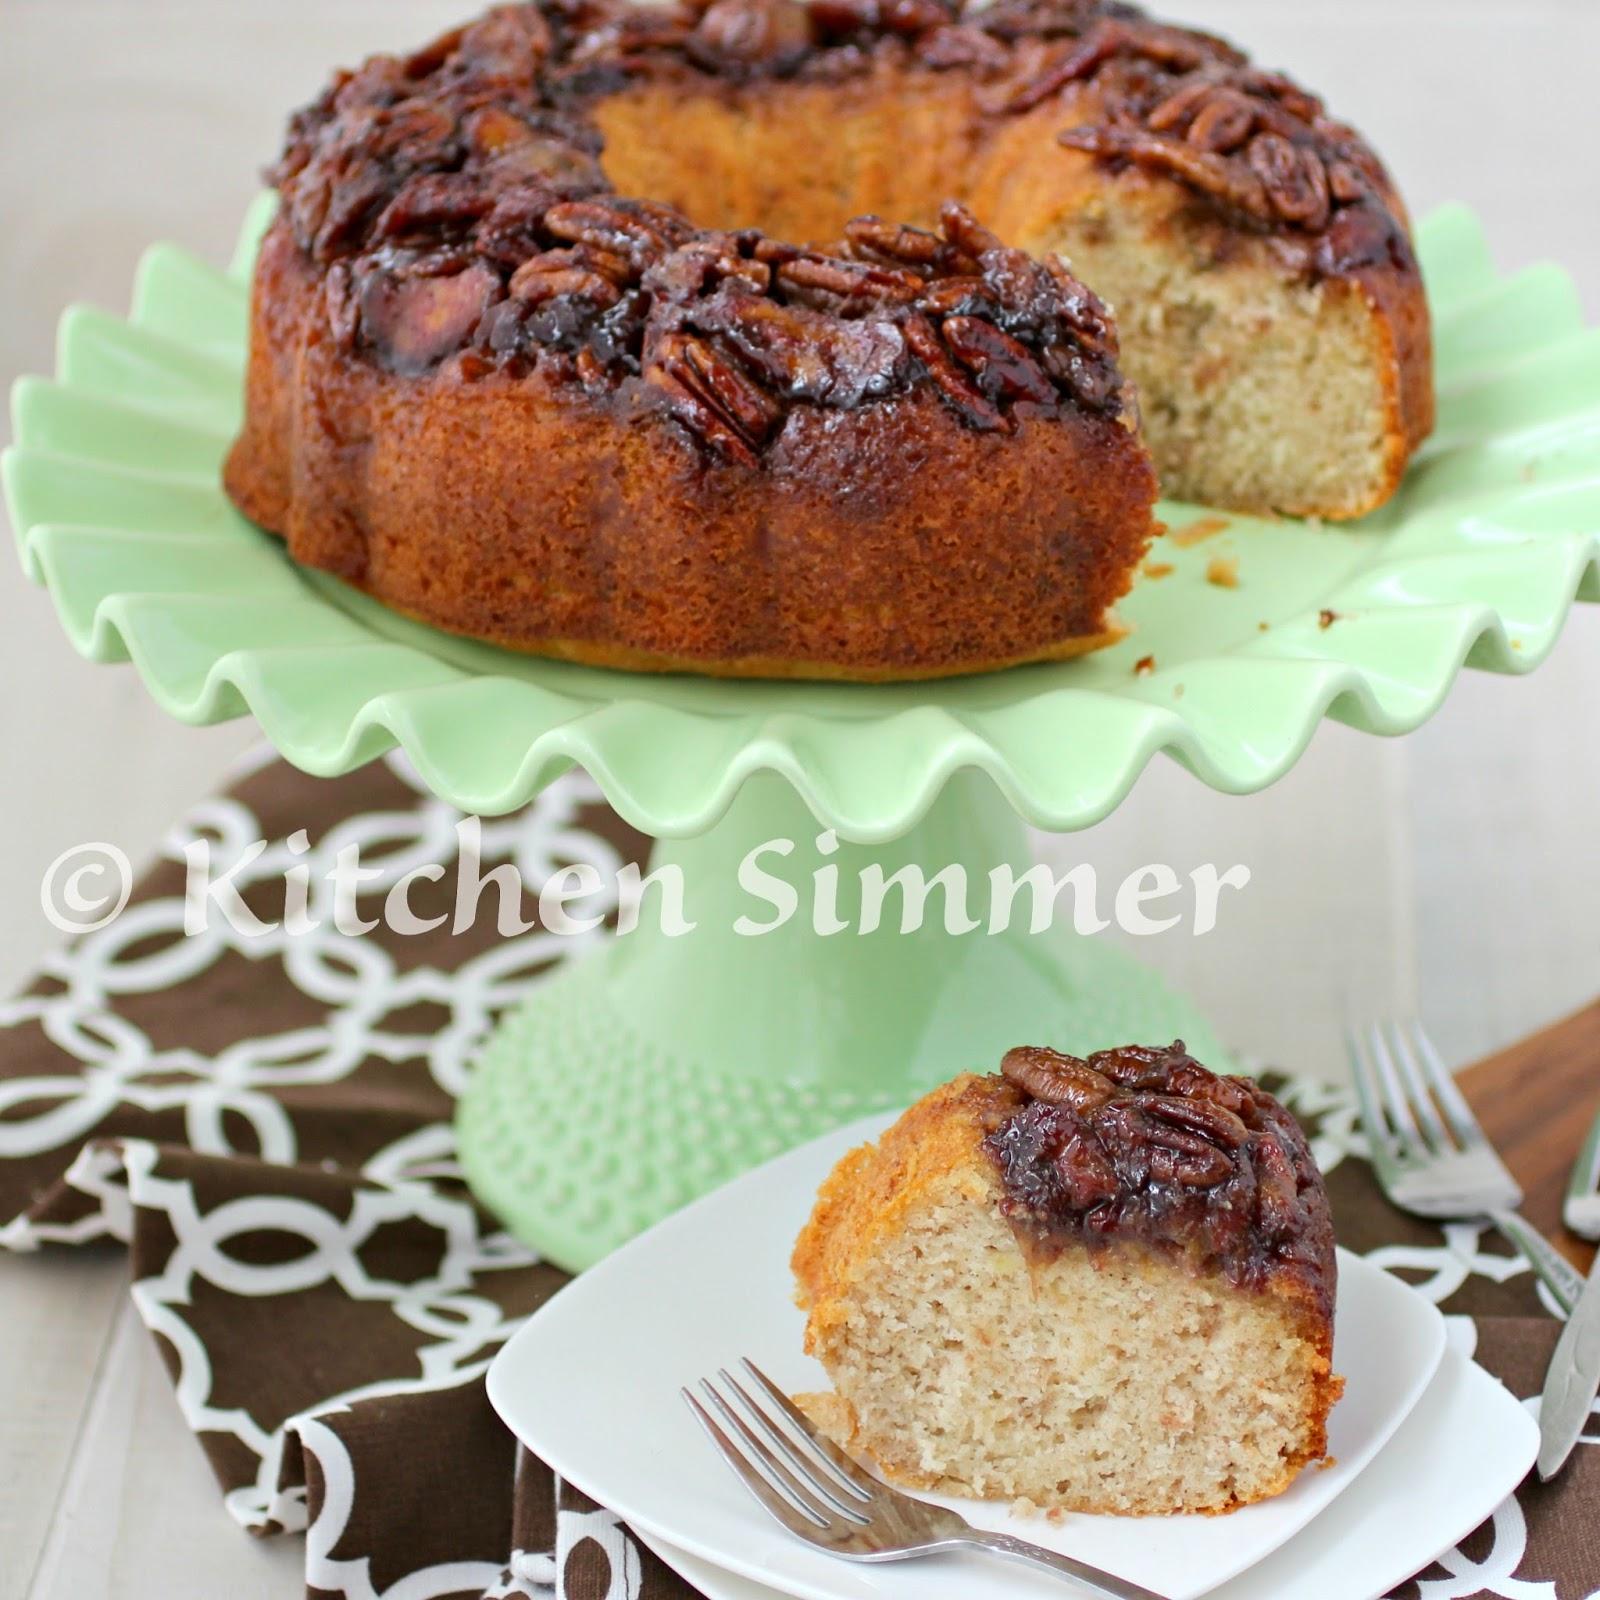 Breakfast Recipes 2017 4 3 Banana Bundt Walnut Cake >> Kitchen Simmer Banana Nut Bundt Cake